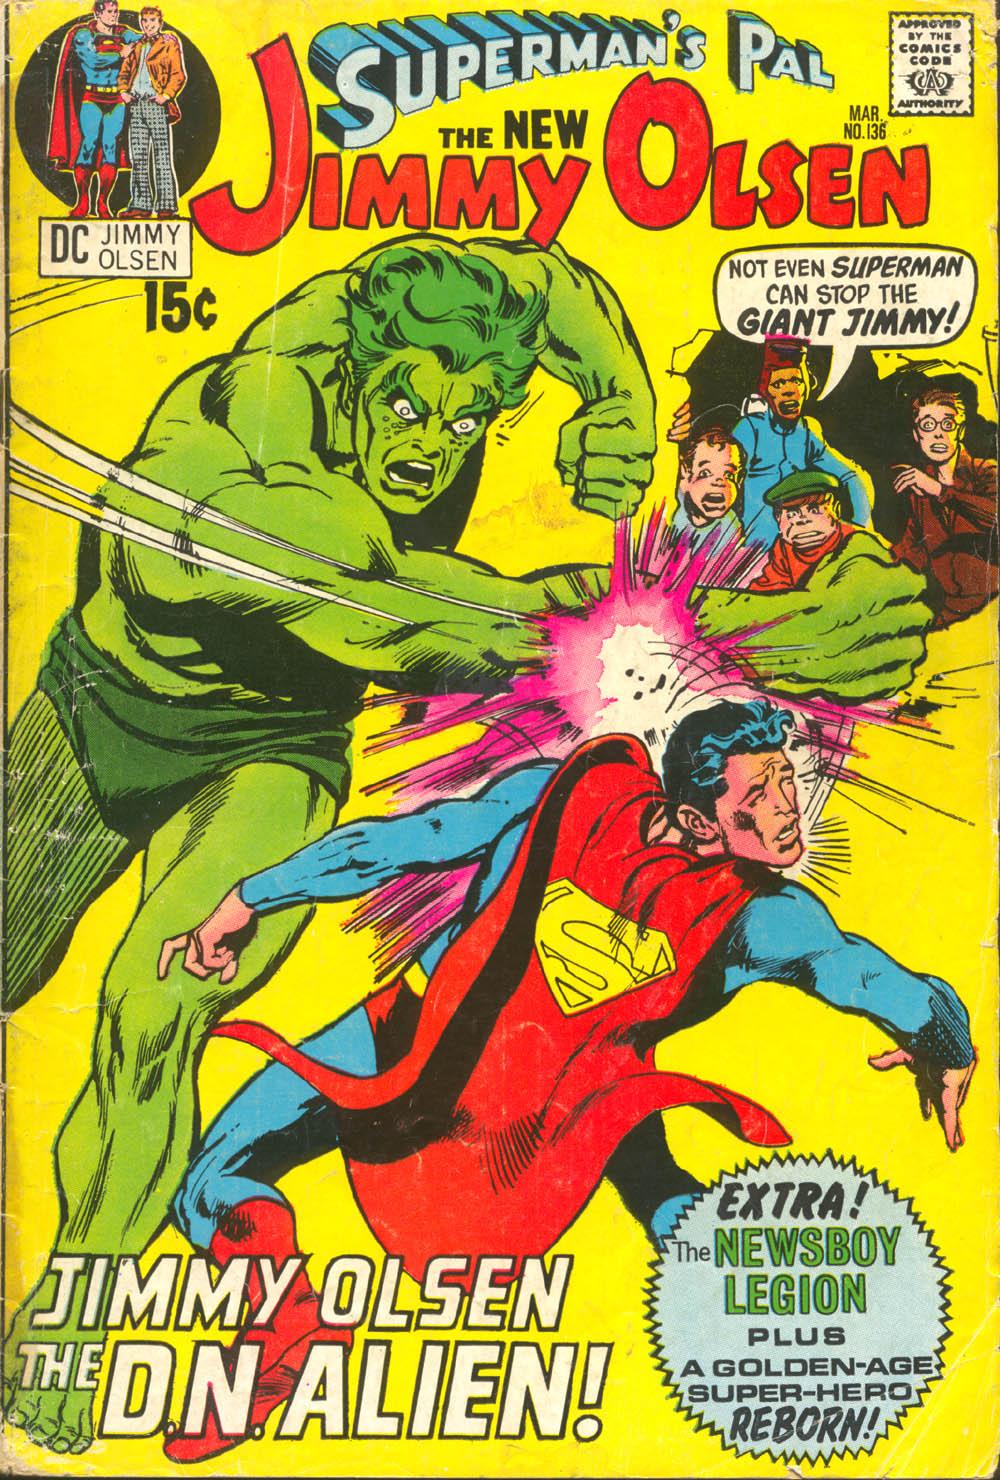 http://vignette3.wikia.nocookie.net/superman/images/f/f8/Supermans_Pal_Jimmy_Olsen_136.jpg/revision/latest?cb=20120214194638